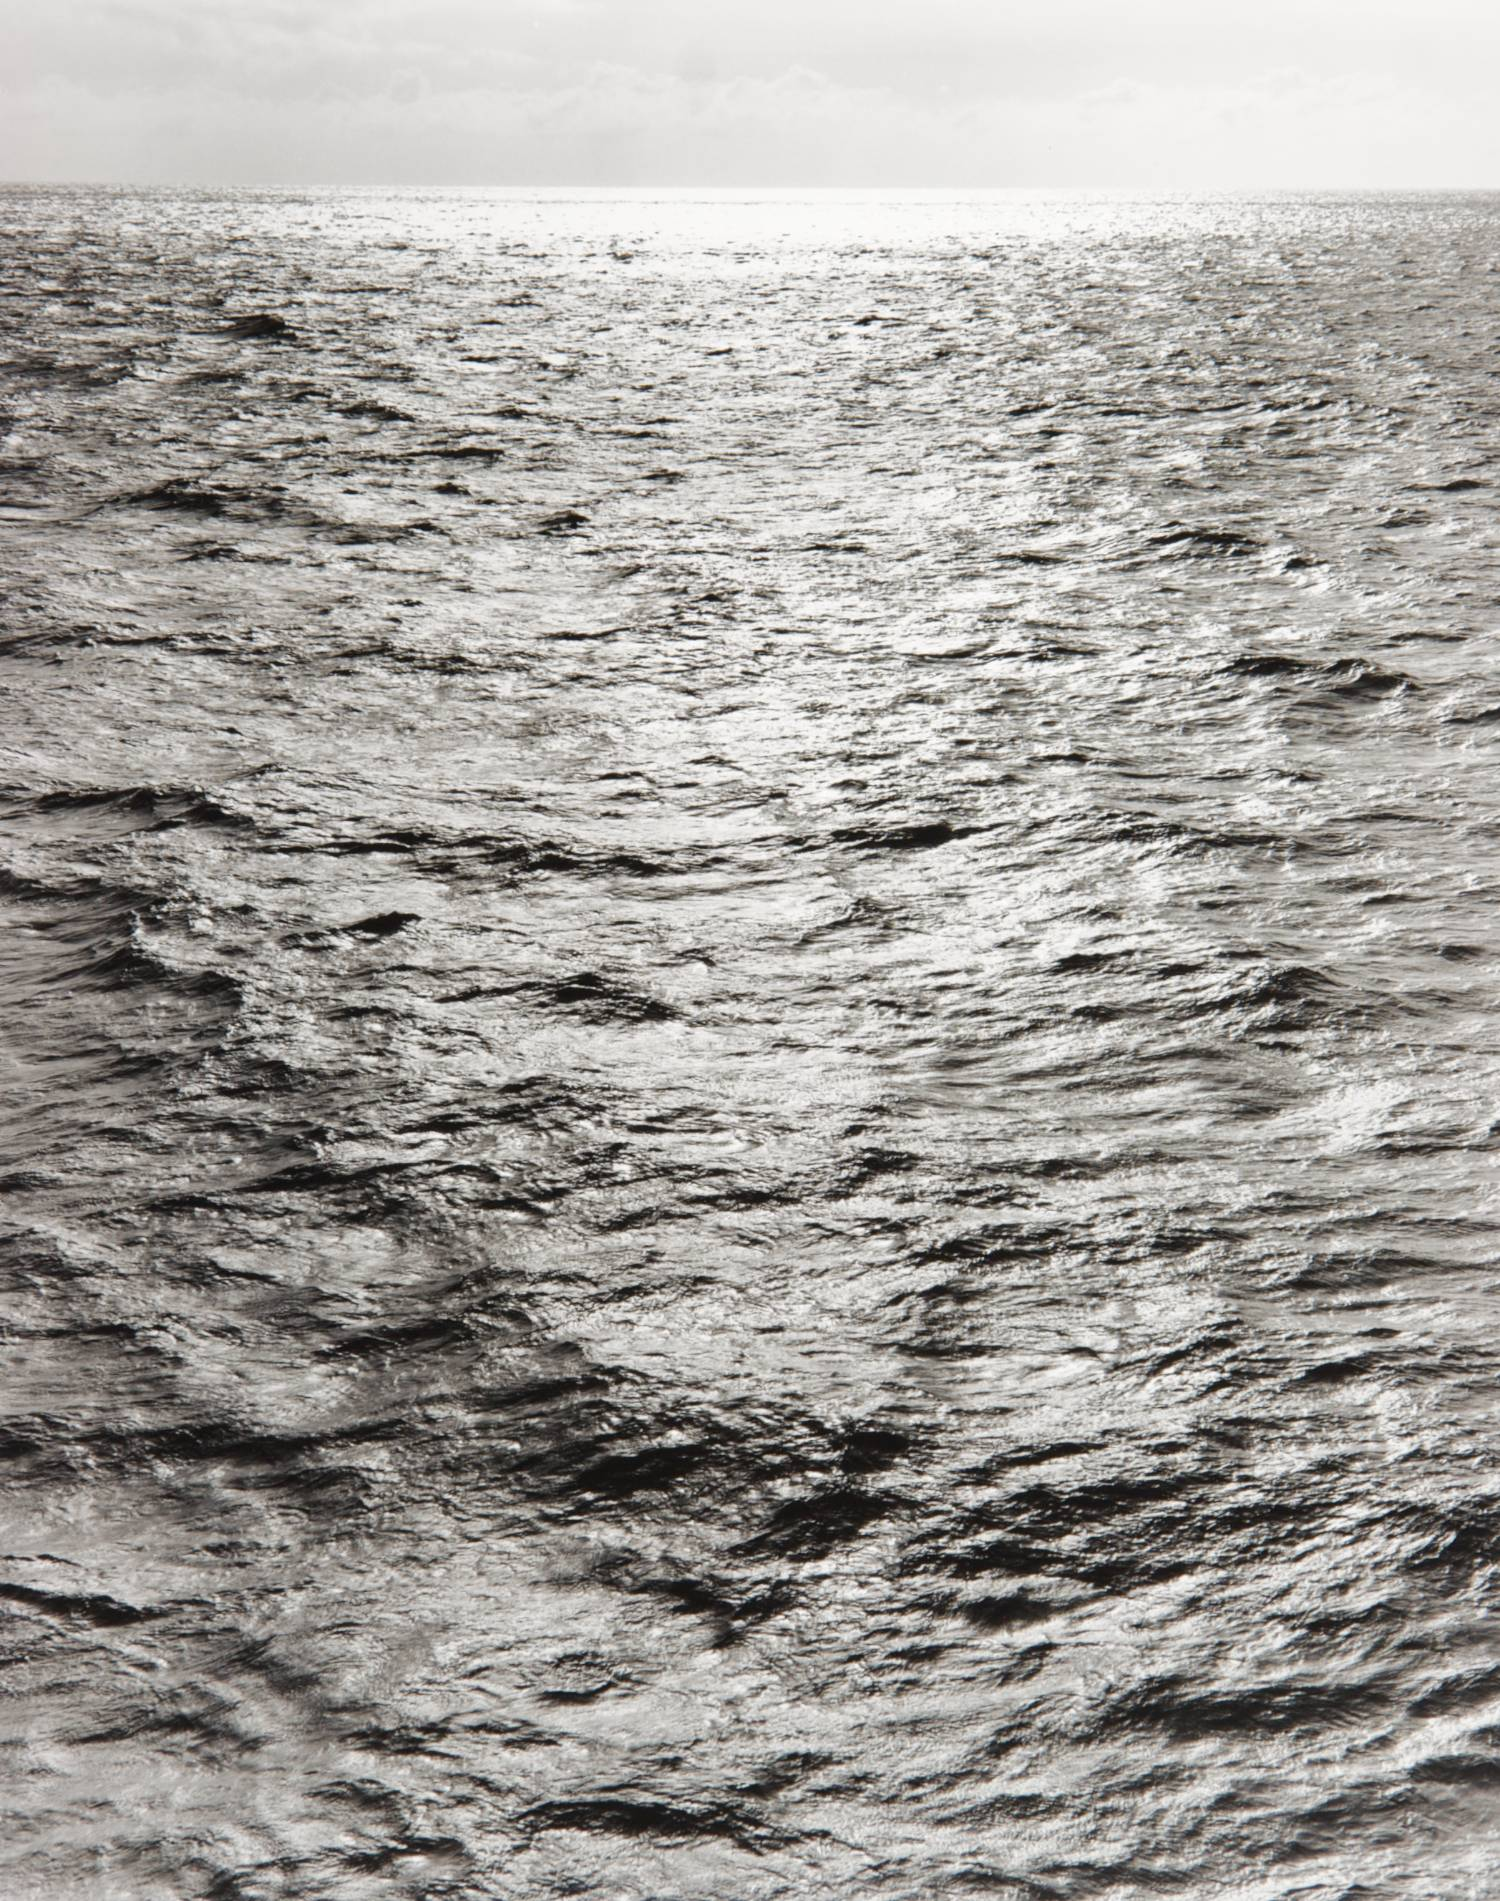 Silver Ocean (Atlantic Ocean)